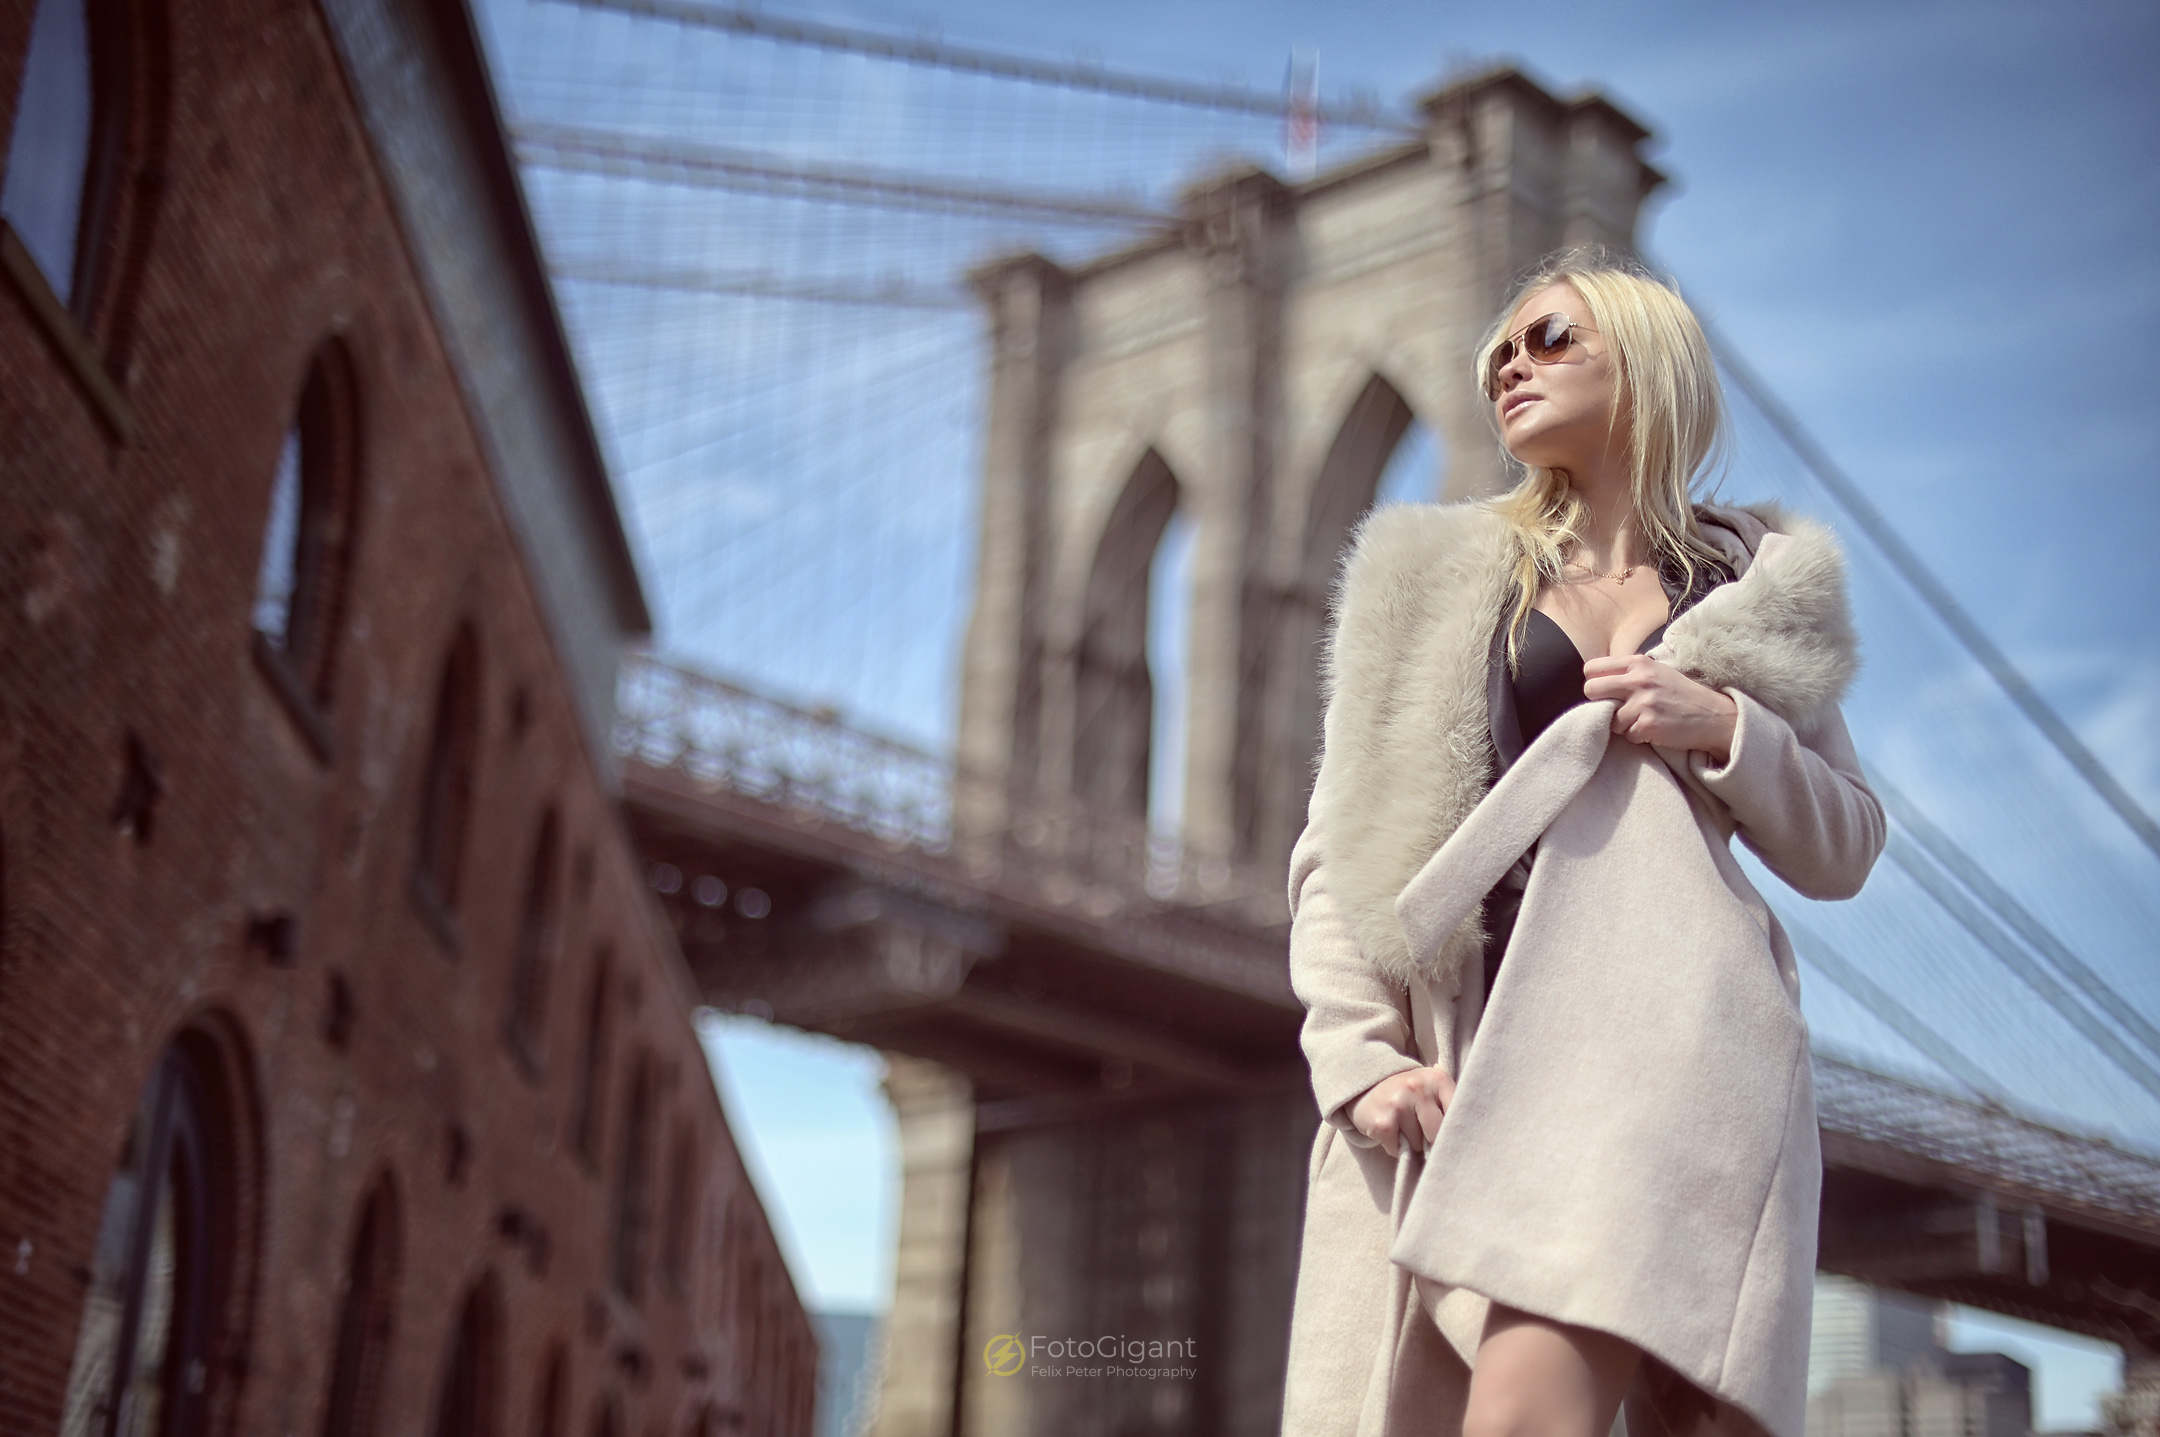 NewYork_JuliaKolomiyets_Fashionphotography_22.jpg